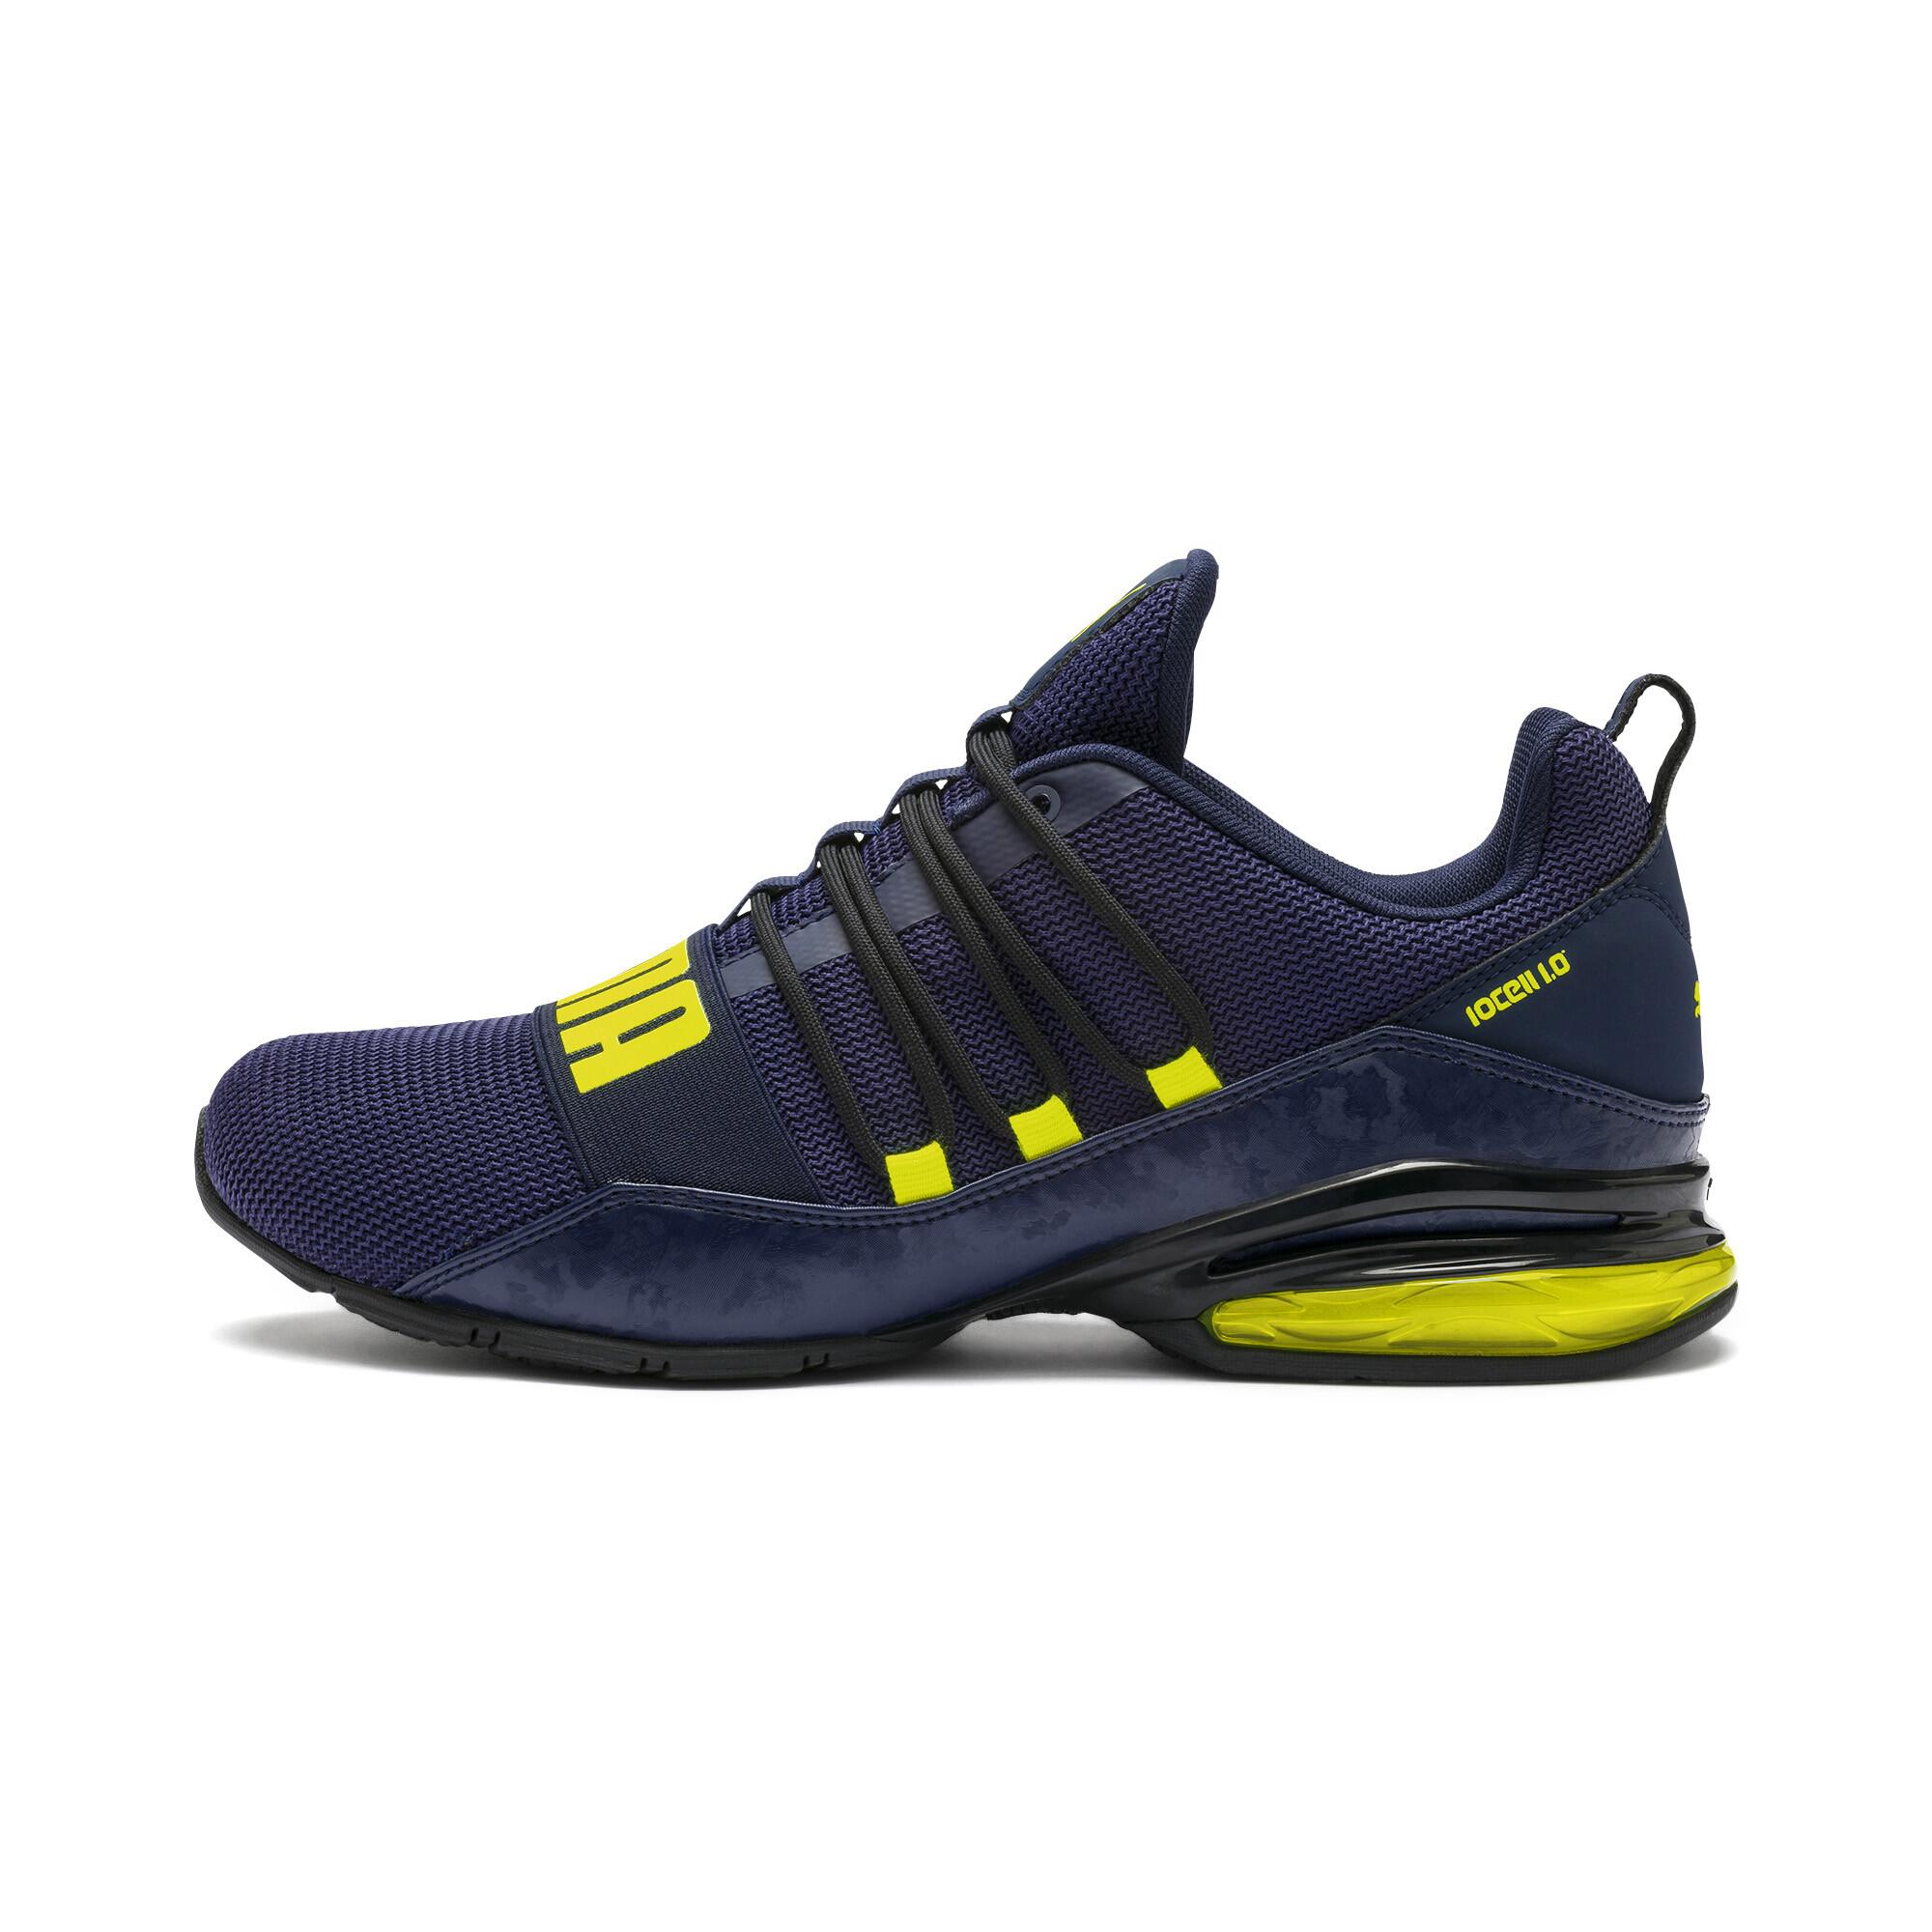 PUMA-CELL-Regulate-Camo-Men-s-Training-Shoes-Men-Shoe-Running thumbnail 11